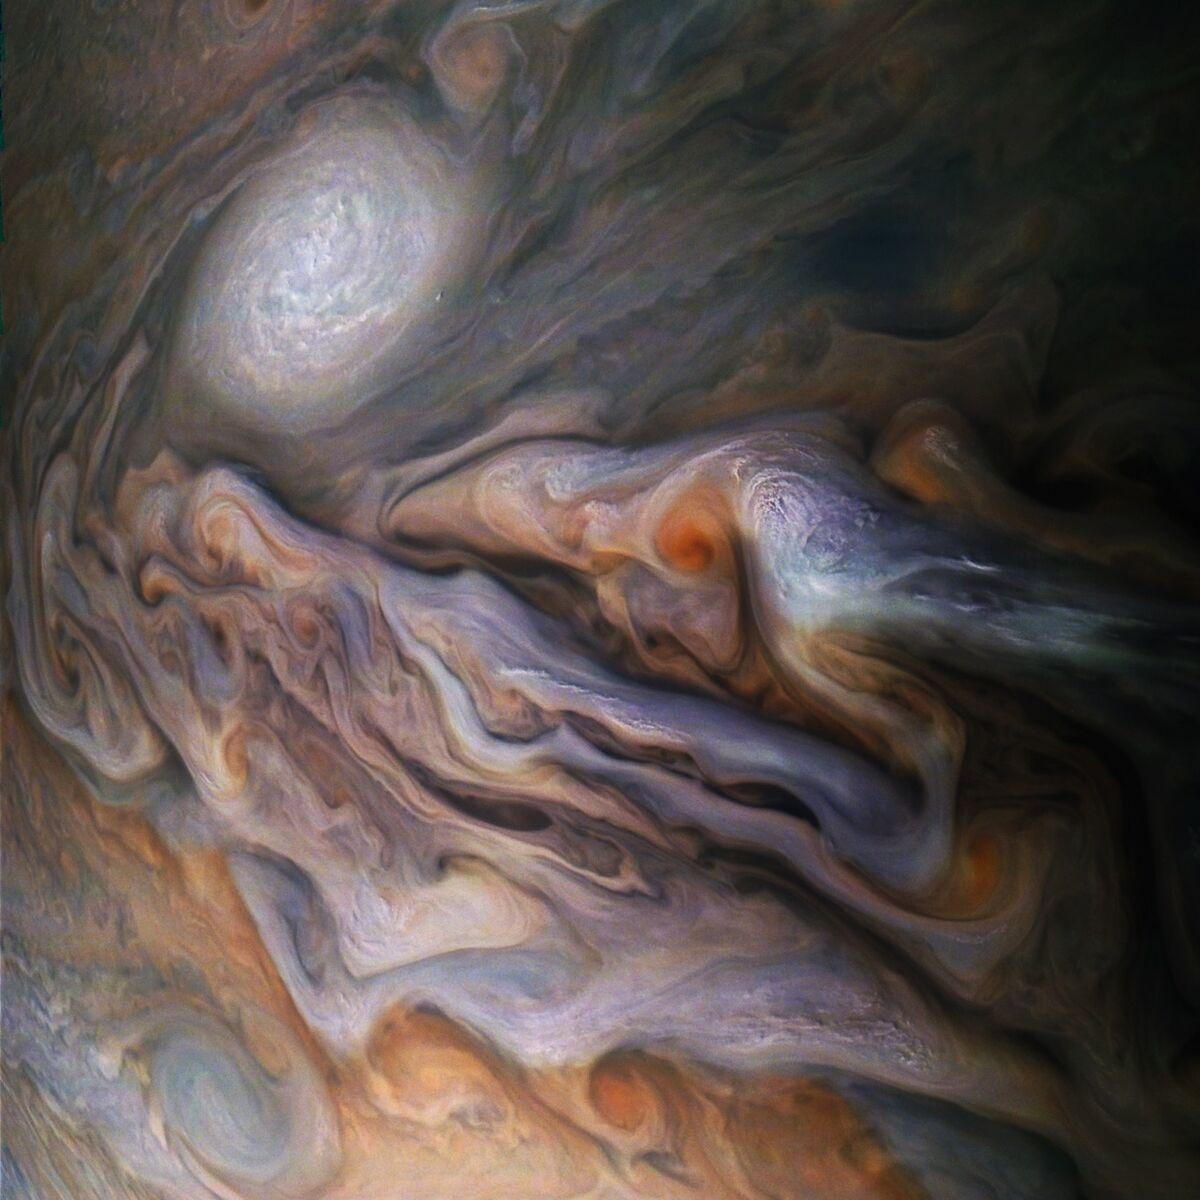 A multitude of swirling clouds in Jupiter's dynamic North North Temperate Belt is captured from NASA's Juno spacecraft. © NASA/JPL-Caltech/SwRI/MSSS/Gerald Eichstädt/Seán Doran.